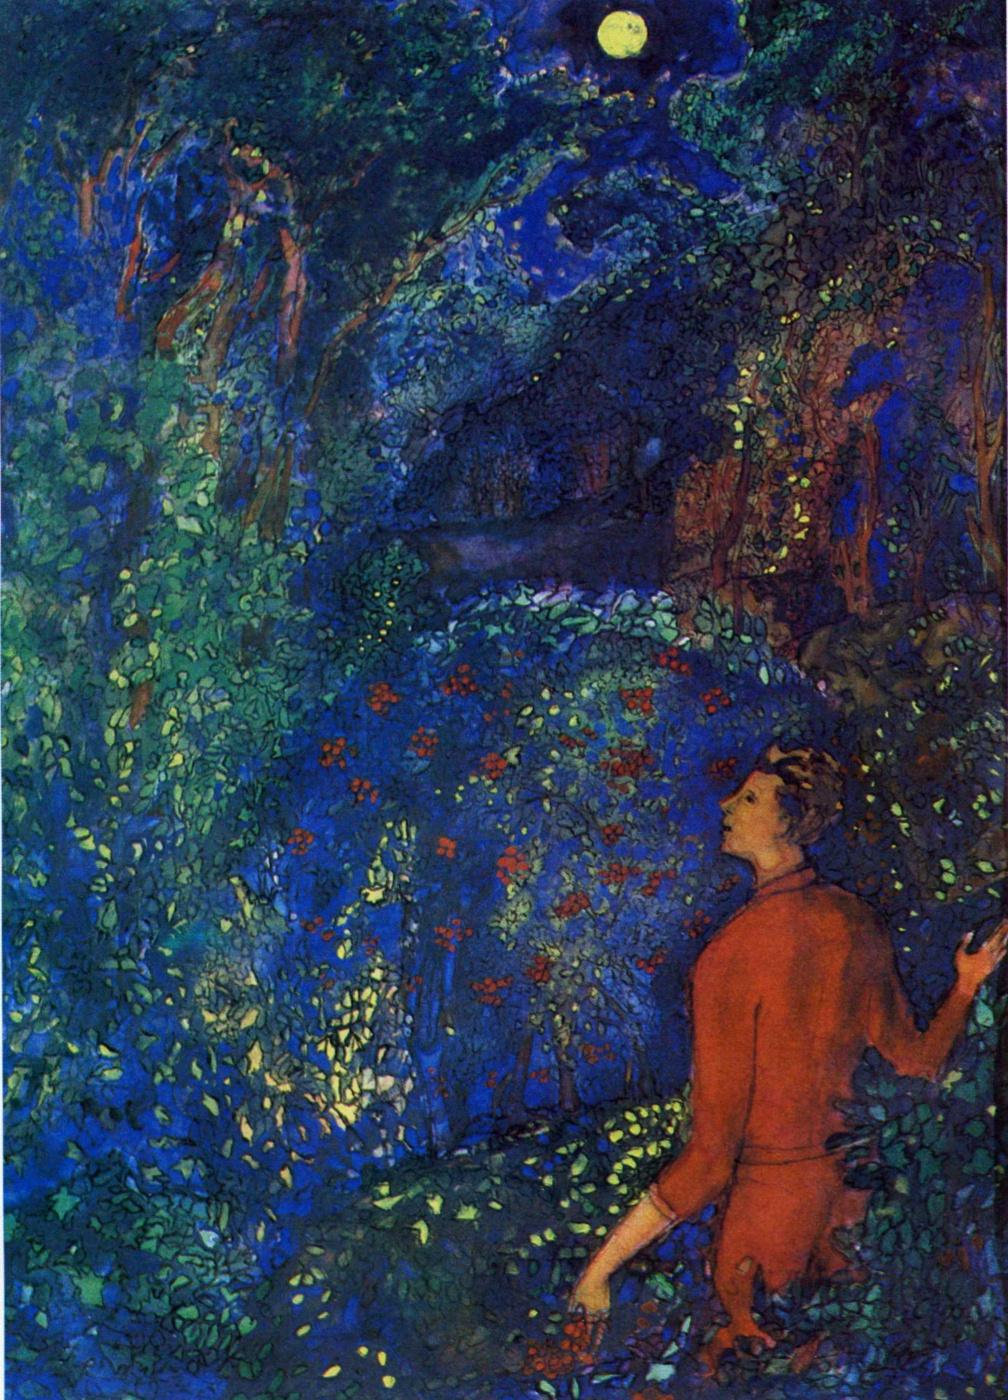 Vladimir Vasilyevich Lubenko. Moonlit night I listen to the birds singing